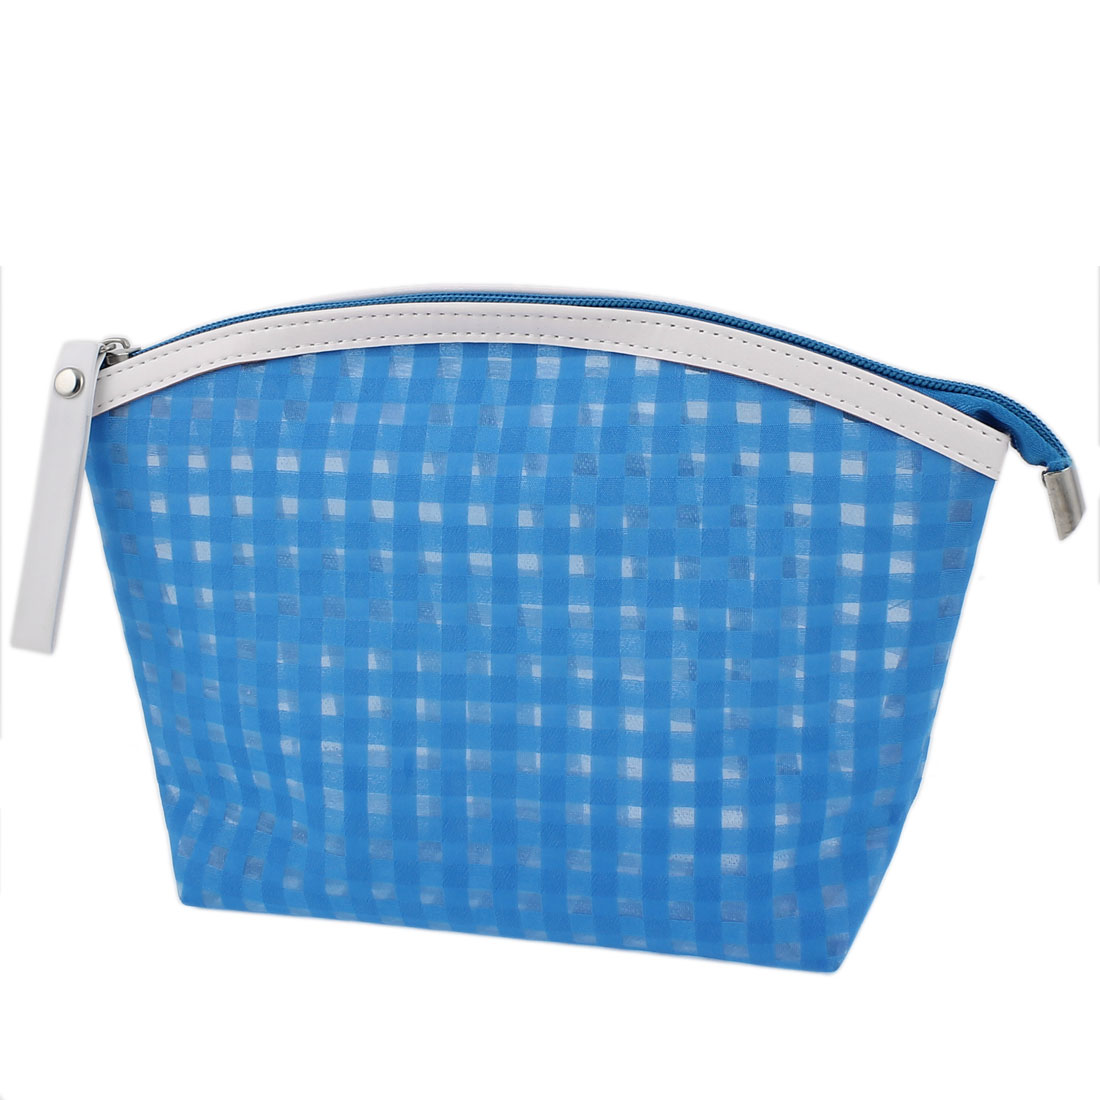 Woman Travel Portable Zipper Closure Plaids Pattern PVC Cosmetic Makeup Bag Toiletries Holder Blue